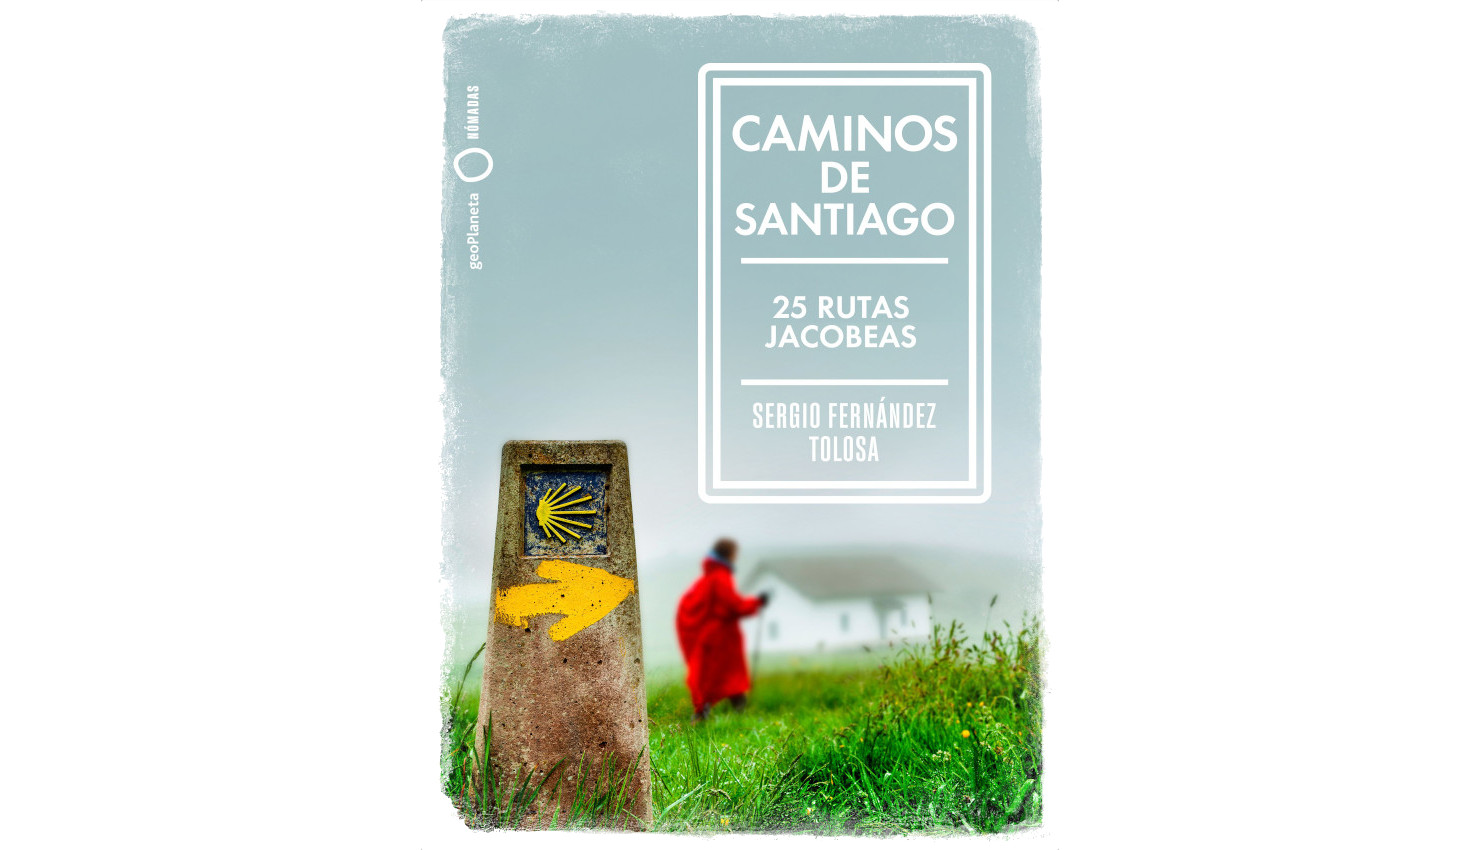 caminos-de-santiago-sergio-fernandez-tolosa-magazinehorse.jpg